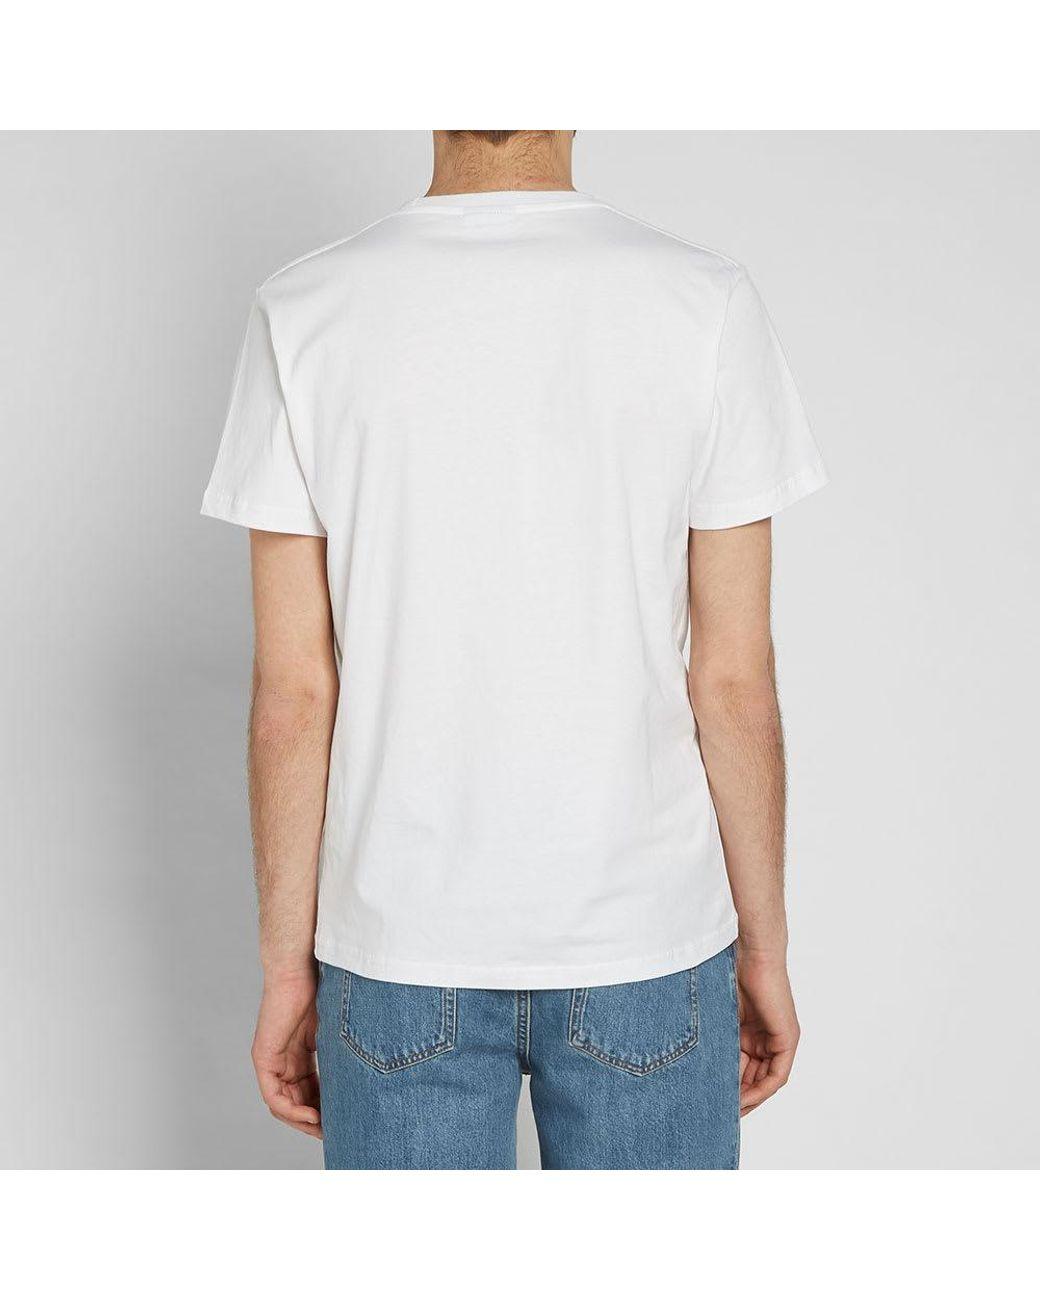 Genuine MINI Signet Print Wing Logo Mens Short Sleeve T-Shirt Top White// Aqua